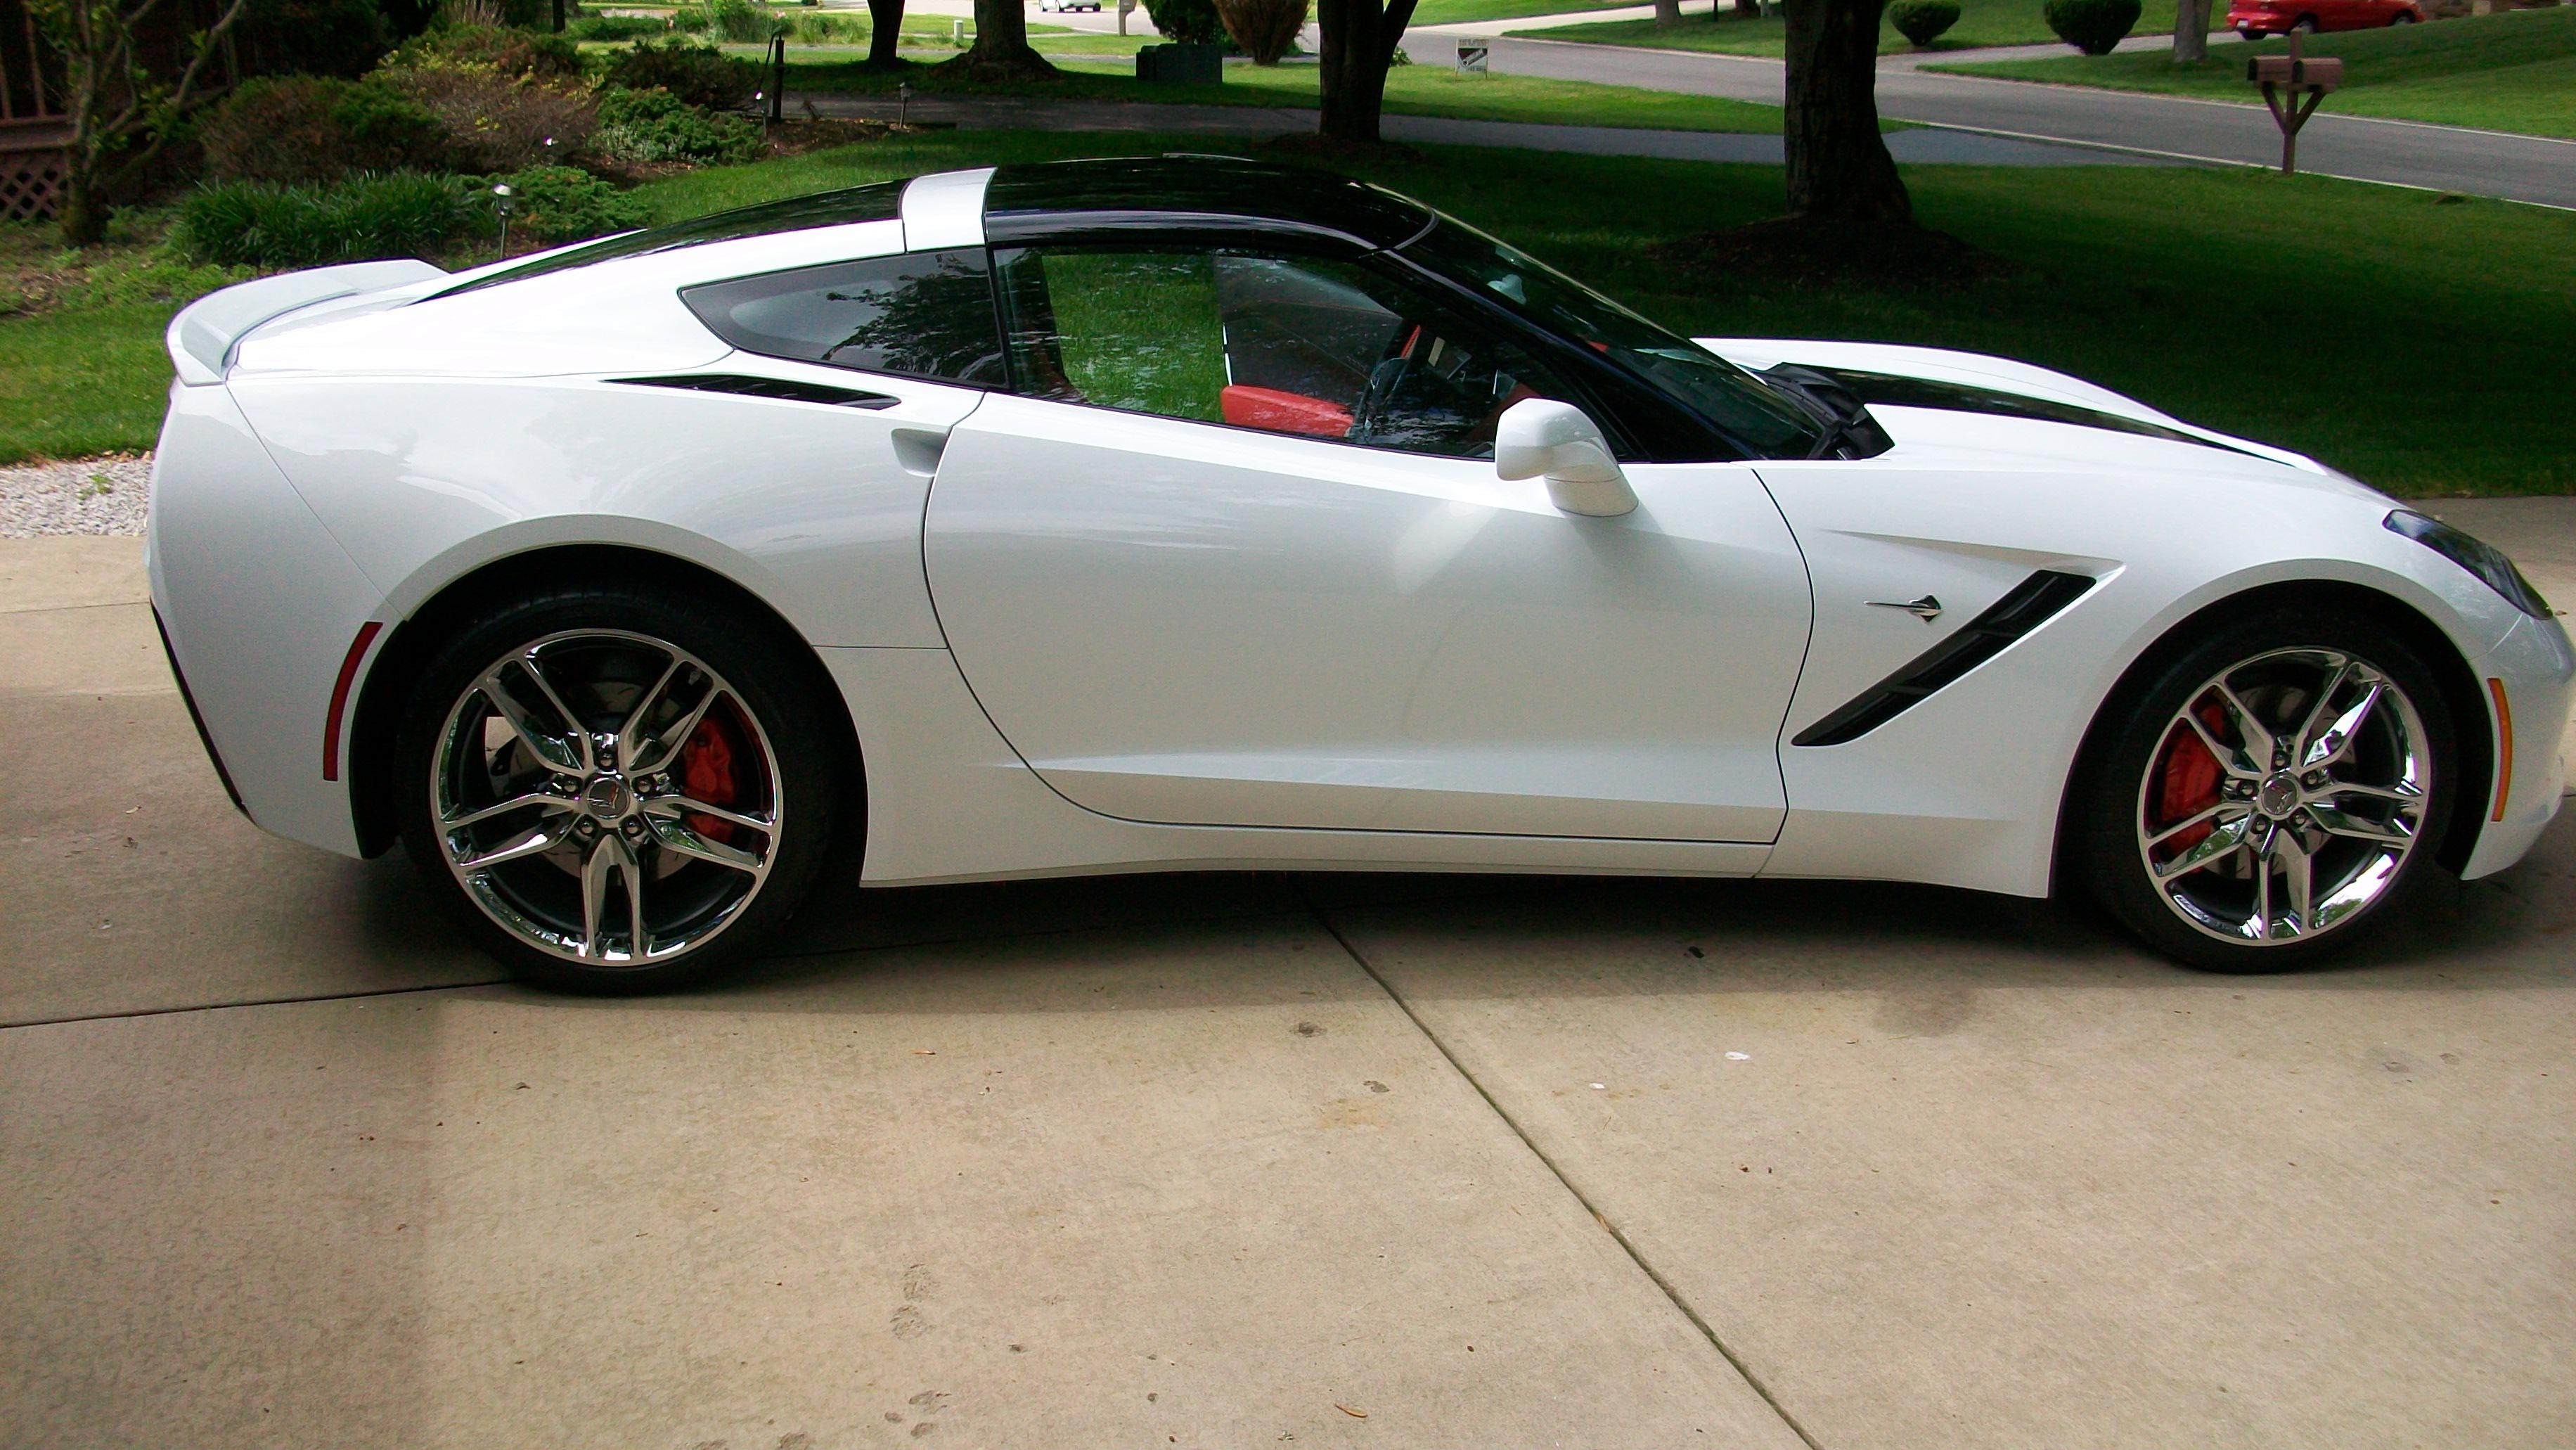 The official Arctic White Stingray Corvette Photo Thread